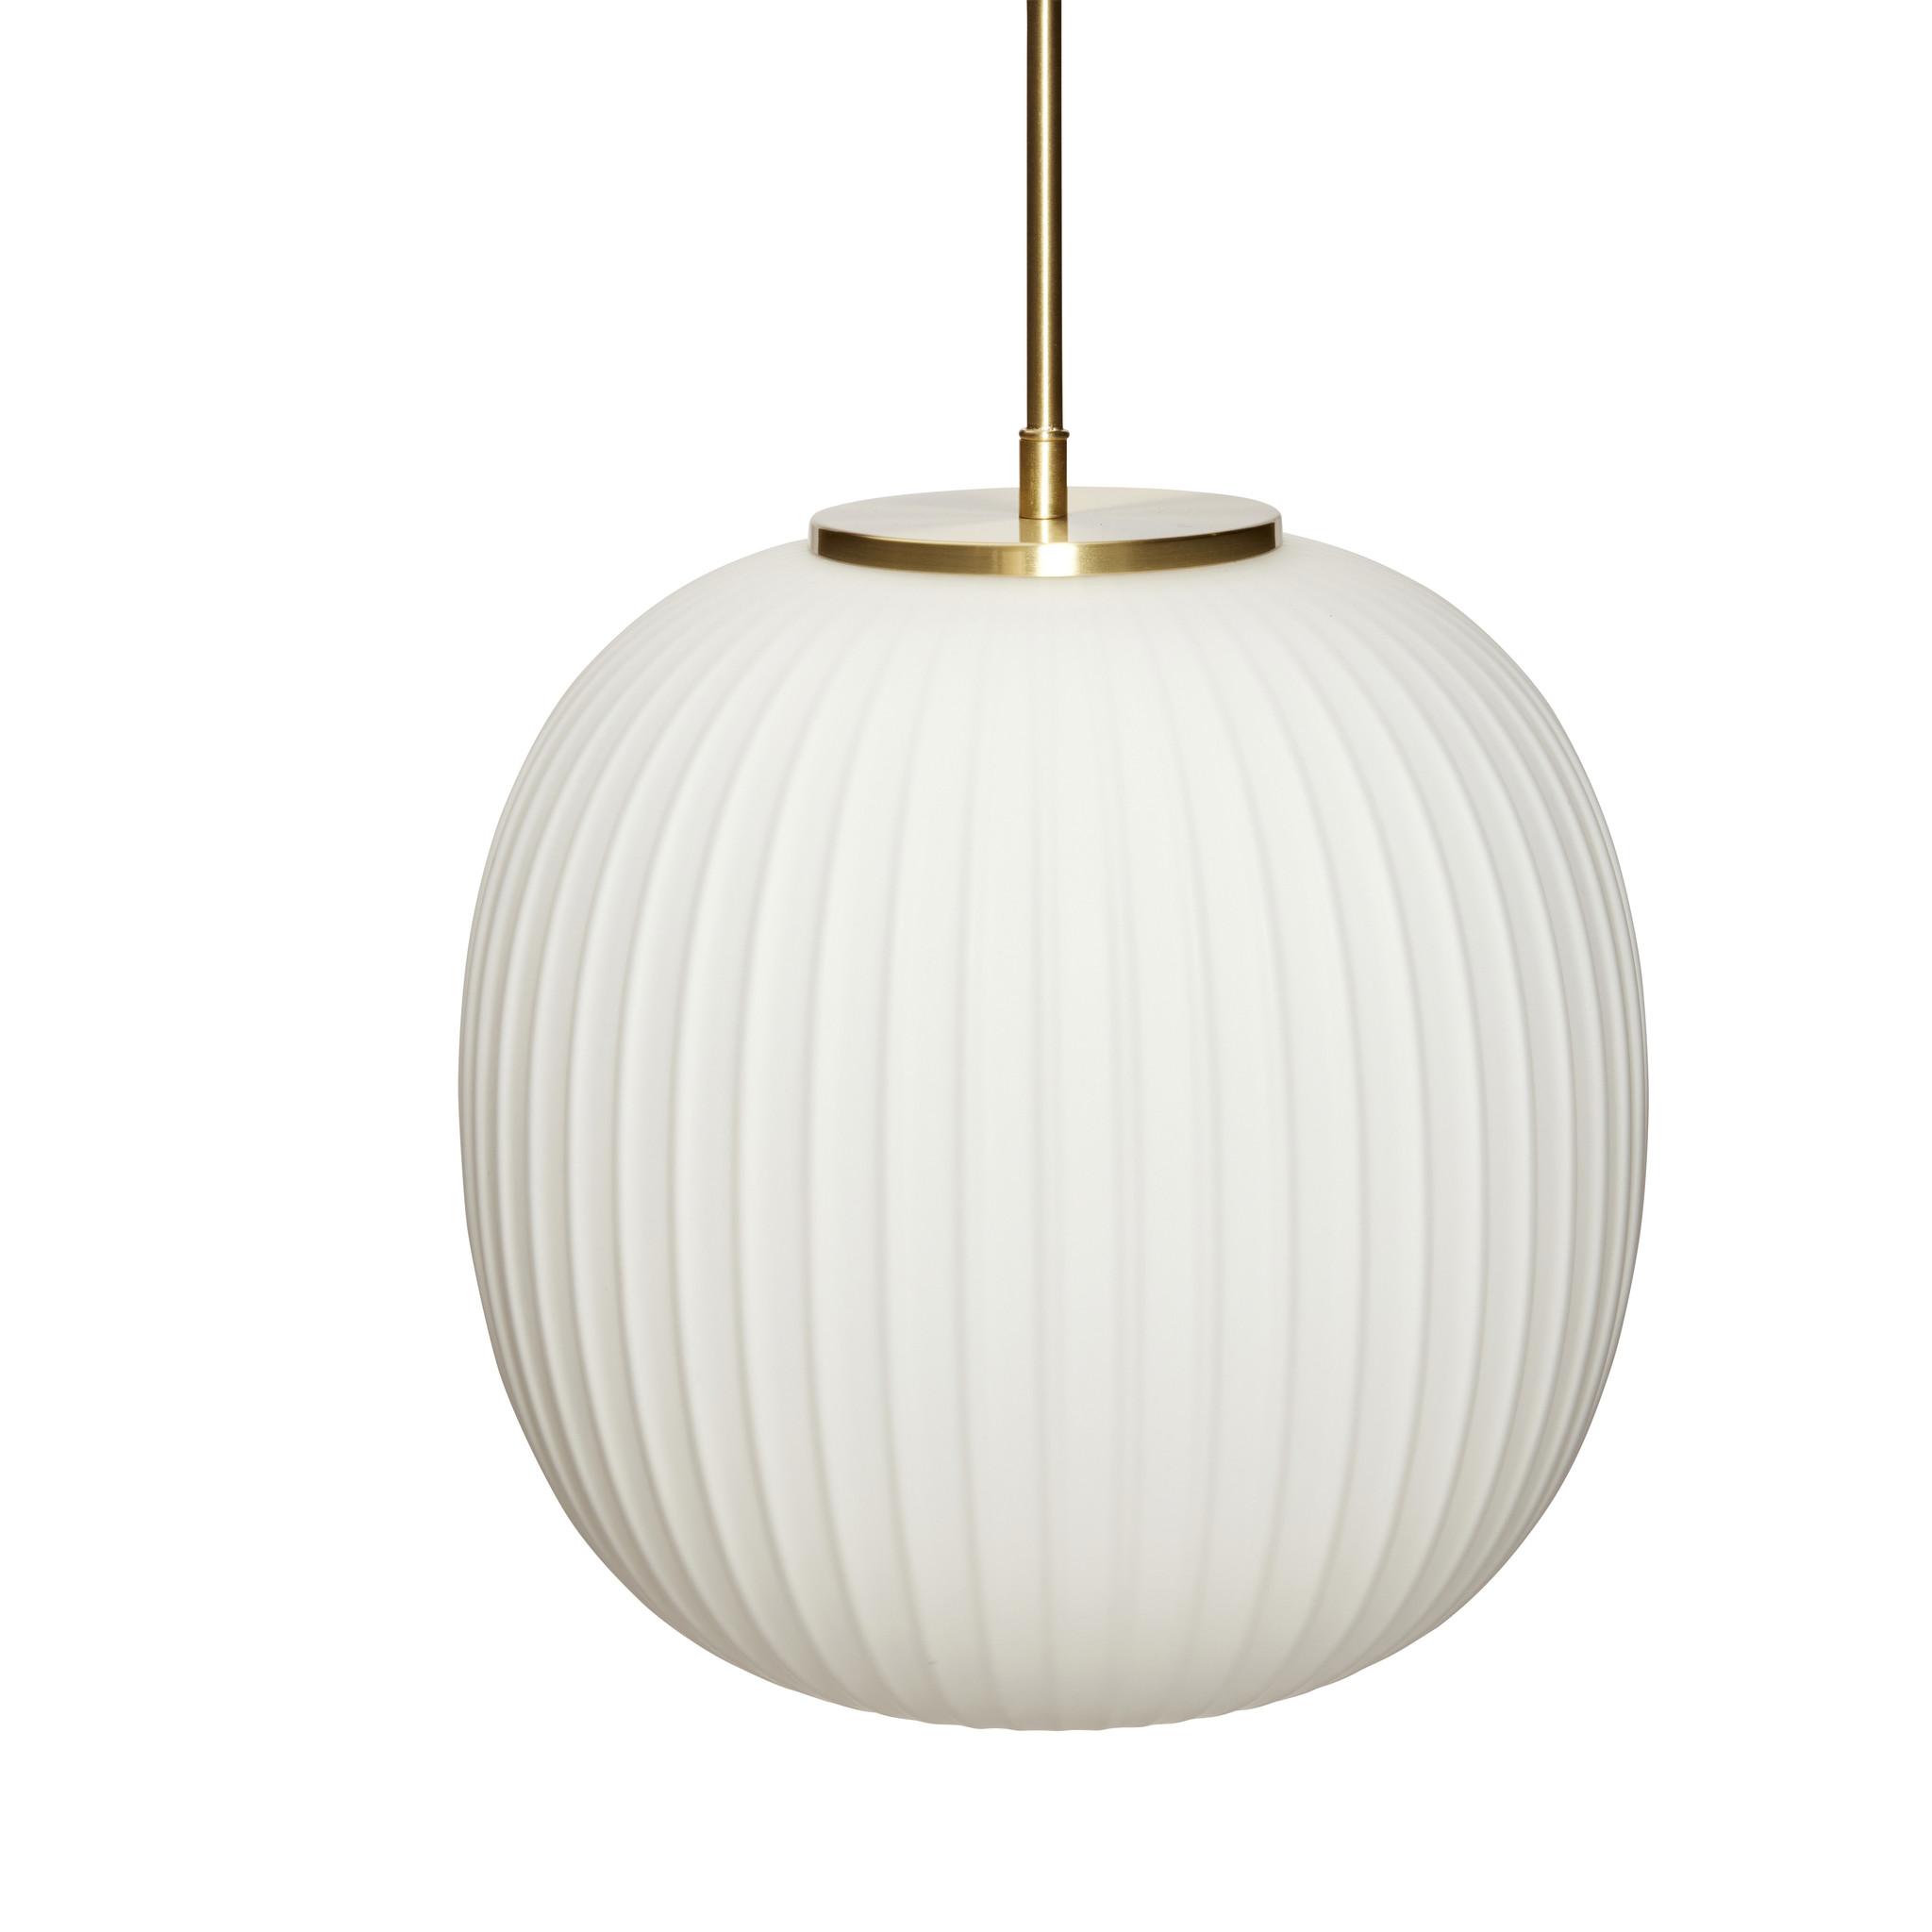 Hubsch Hanglamp glas wit/messing ø32 cm-991320-5712772113110